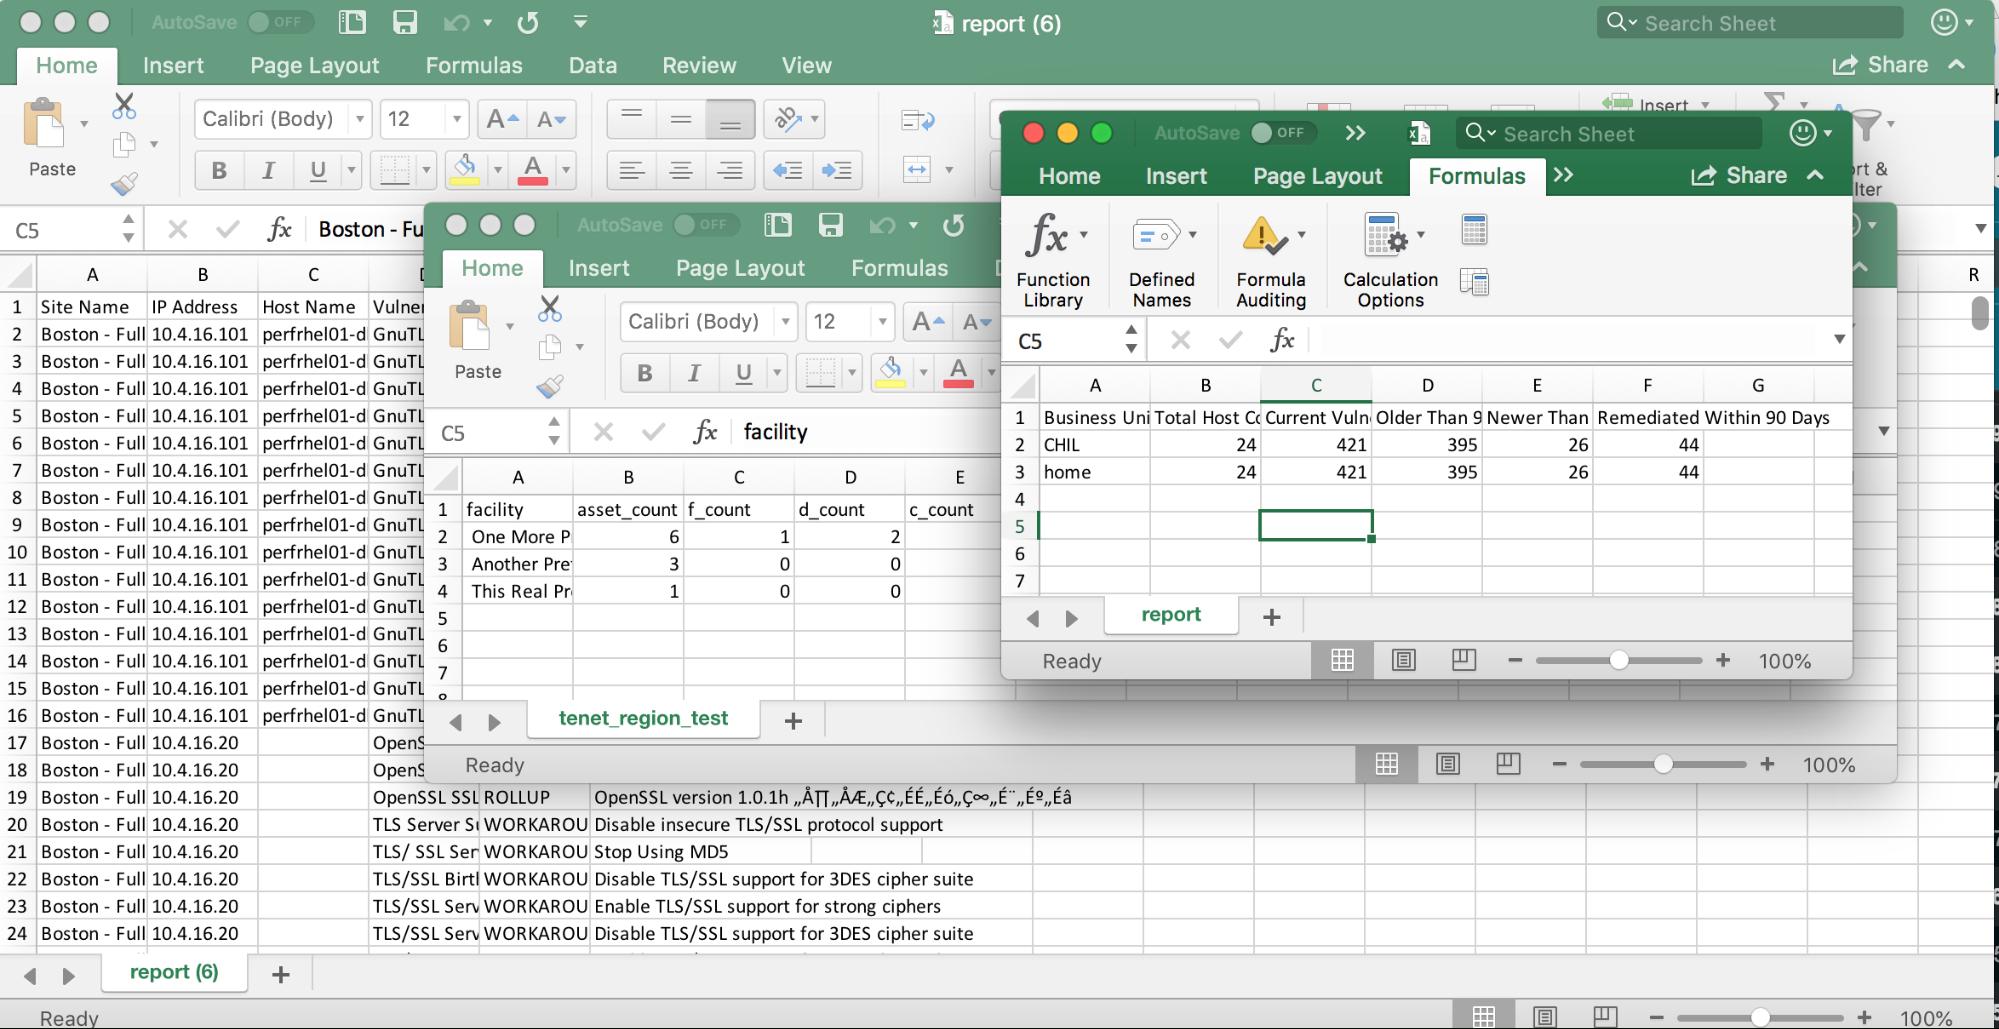 Patch Management Tracking Spreadsheet Inside Streamlining